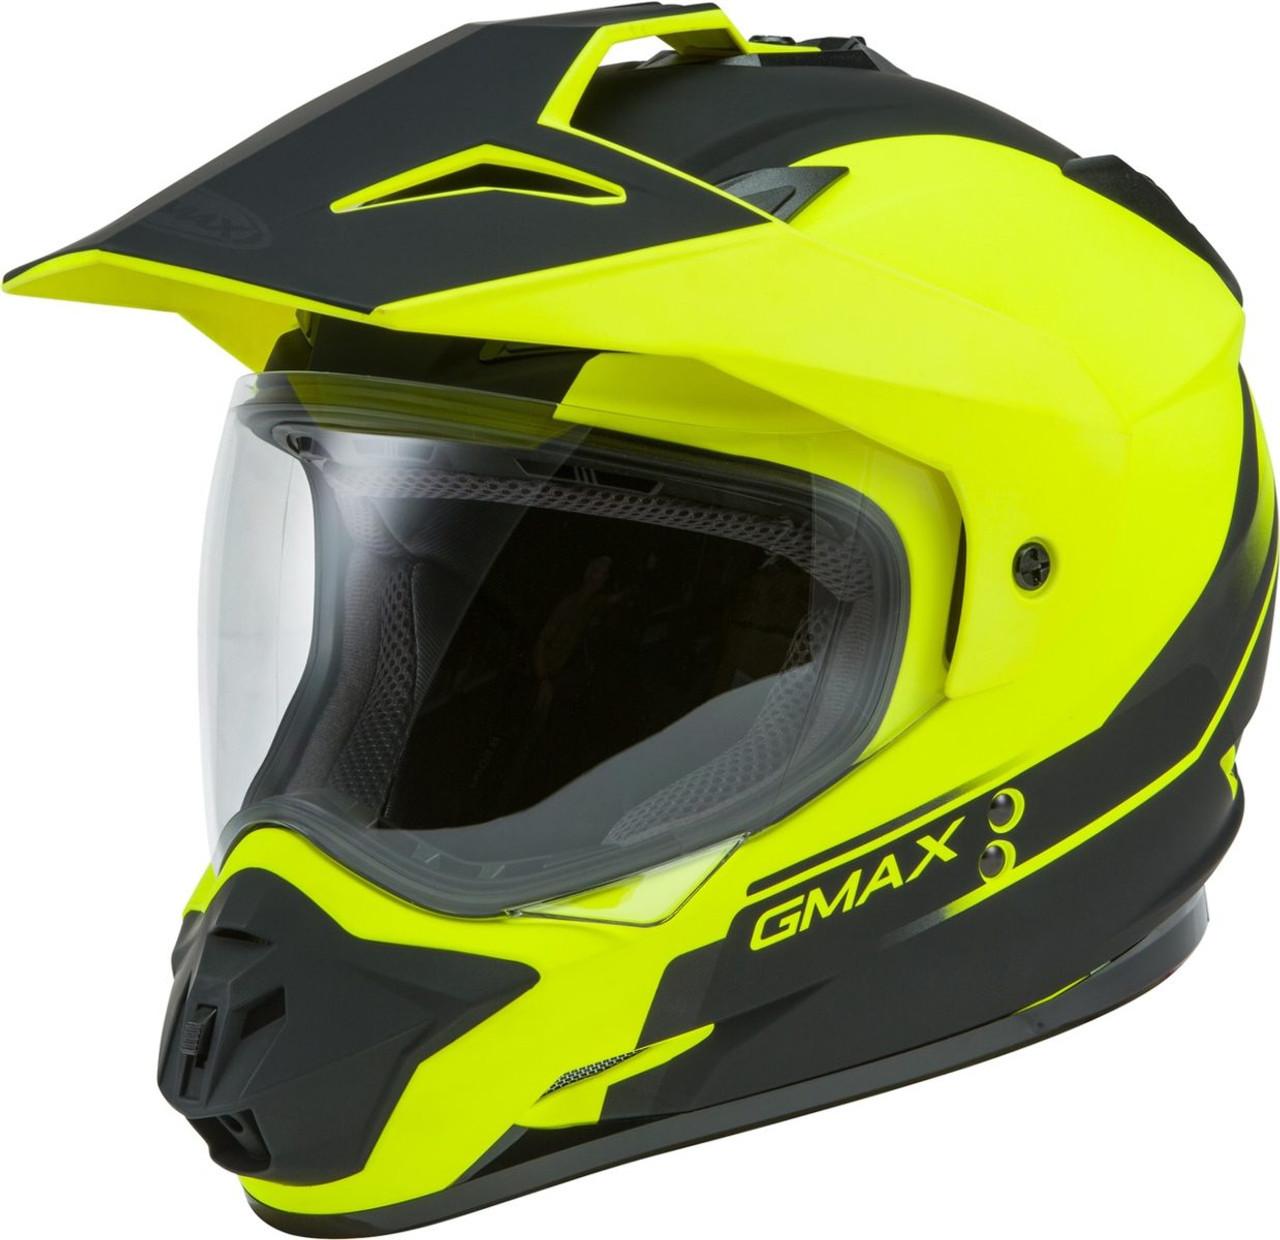 GM-11 Dual-Sport Scud Helmet